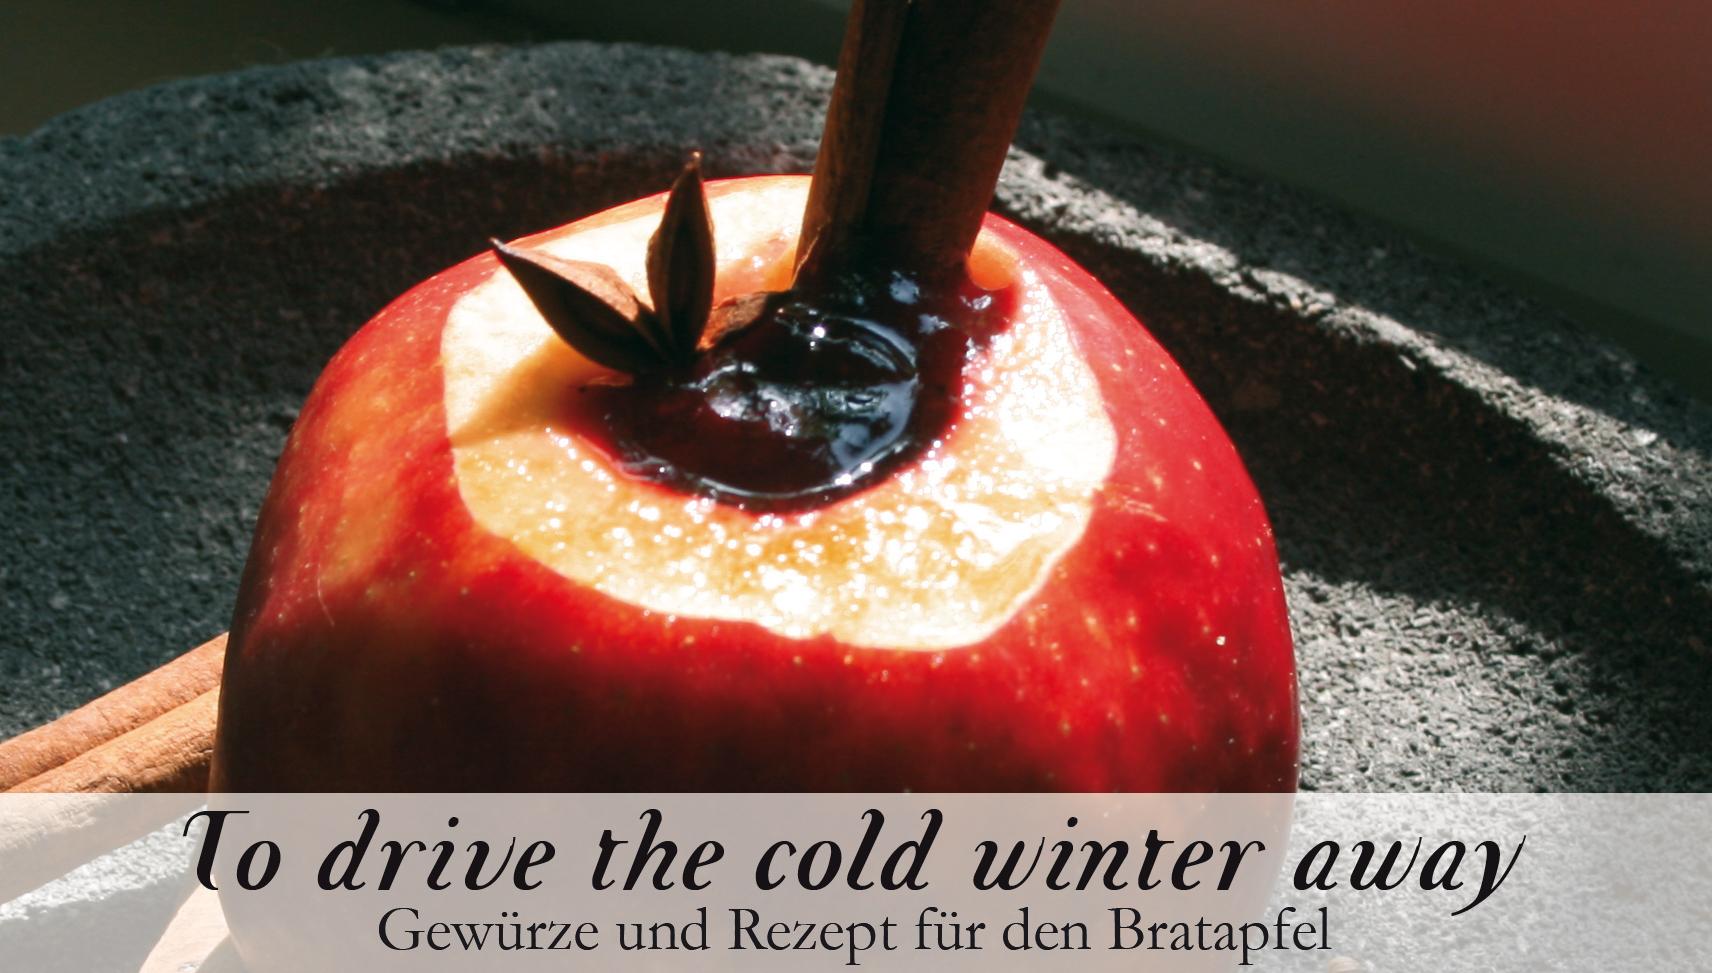 Bratapfel - To drive the cold Winter away-Gewürzkasten